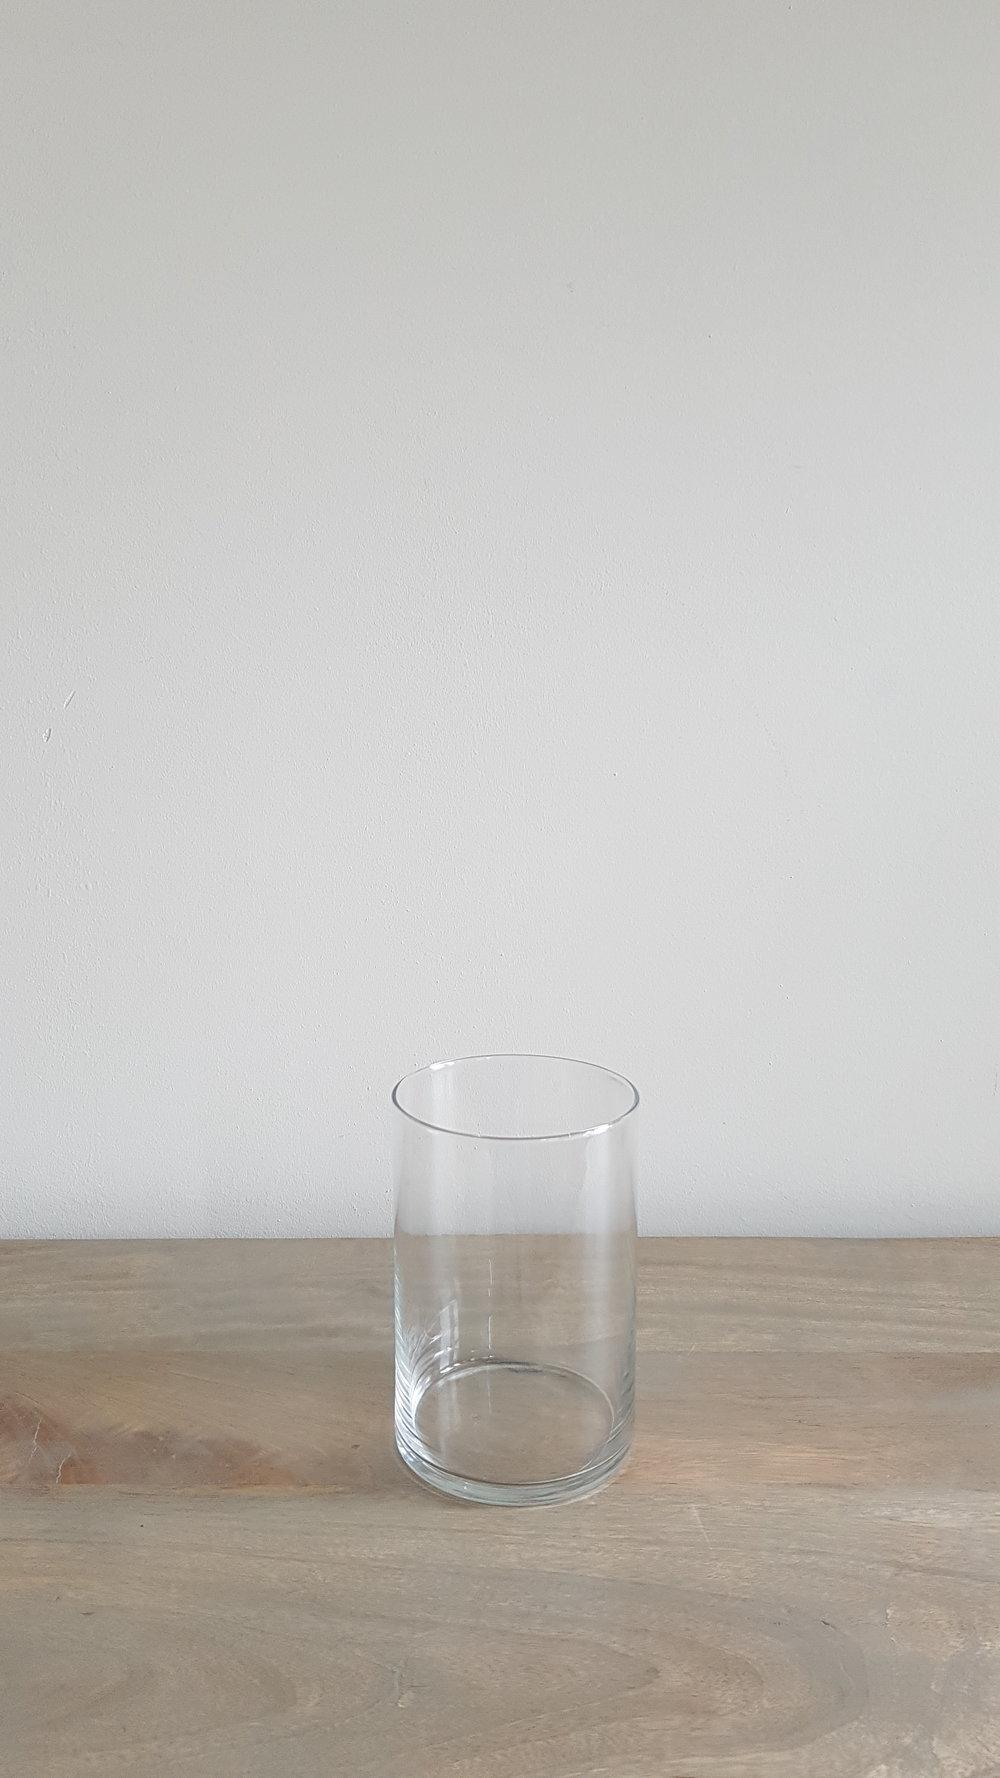 "6"" Glass Cylinder Vase - $1 each   Qty: 50"